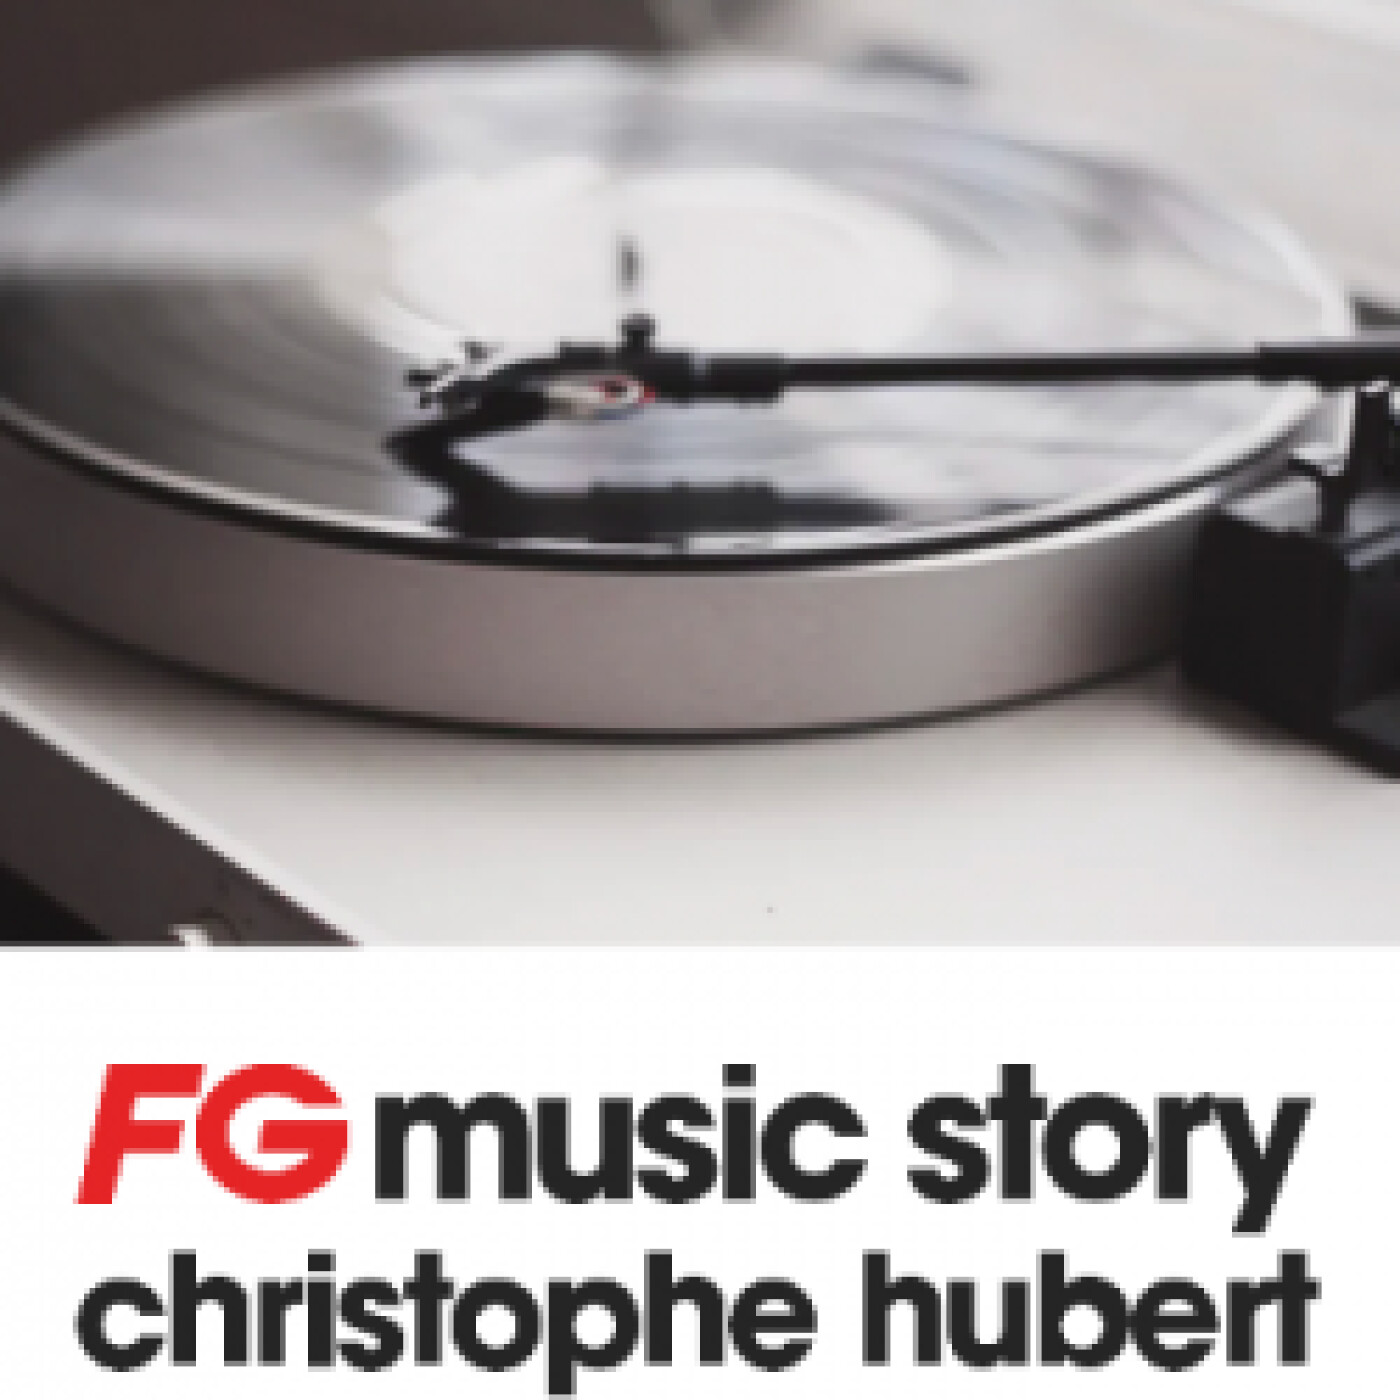 FG MUSIC STORY : REGARD